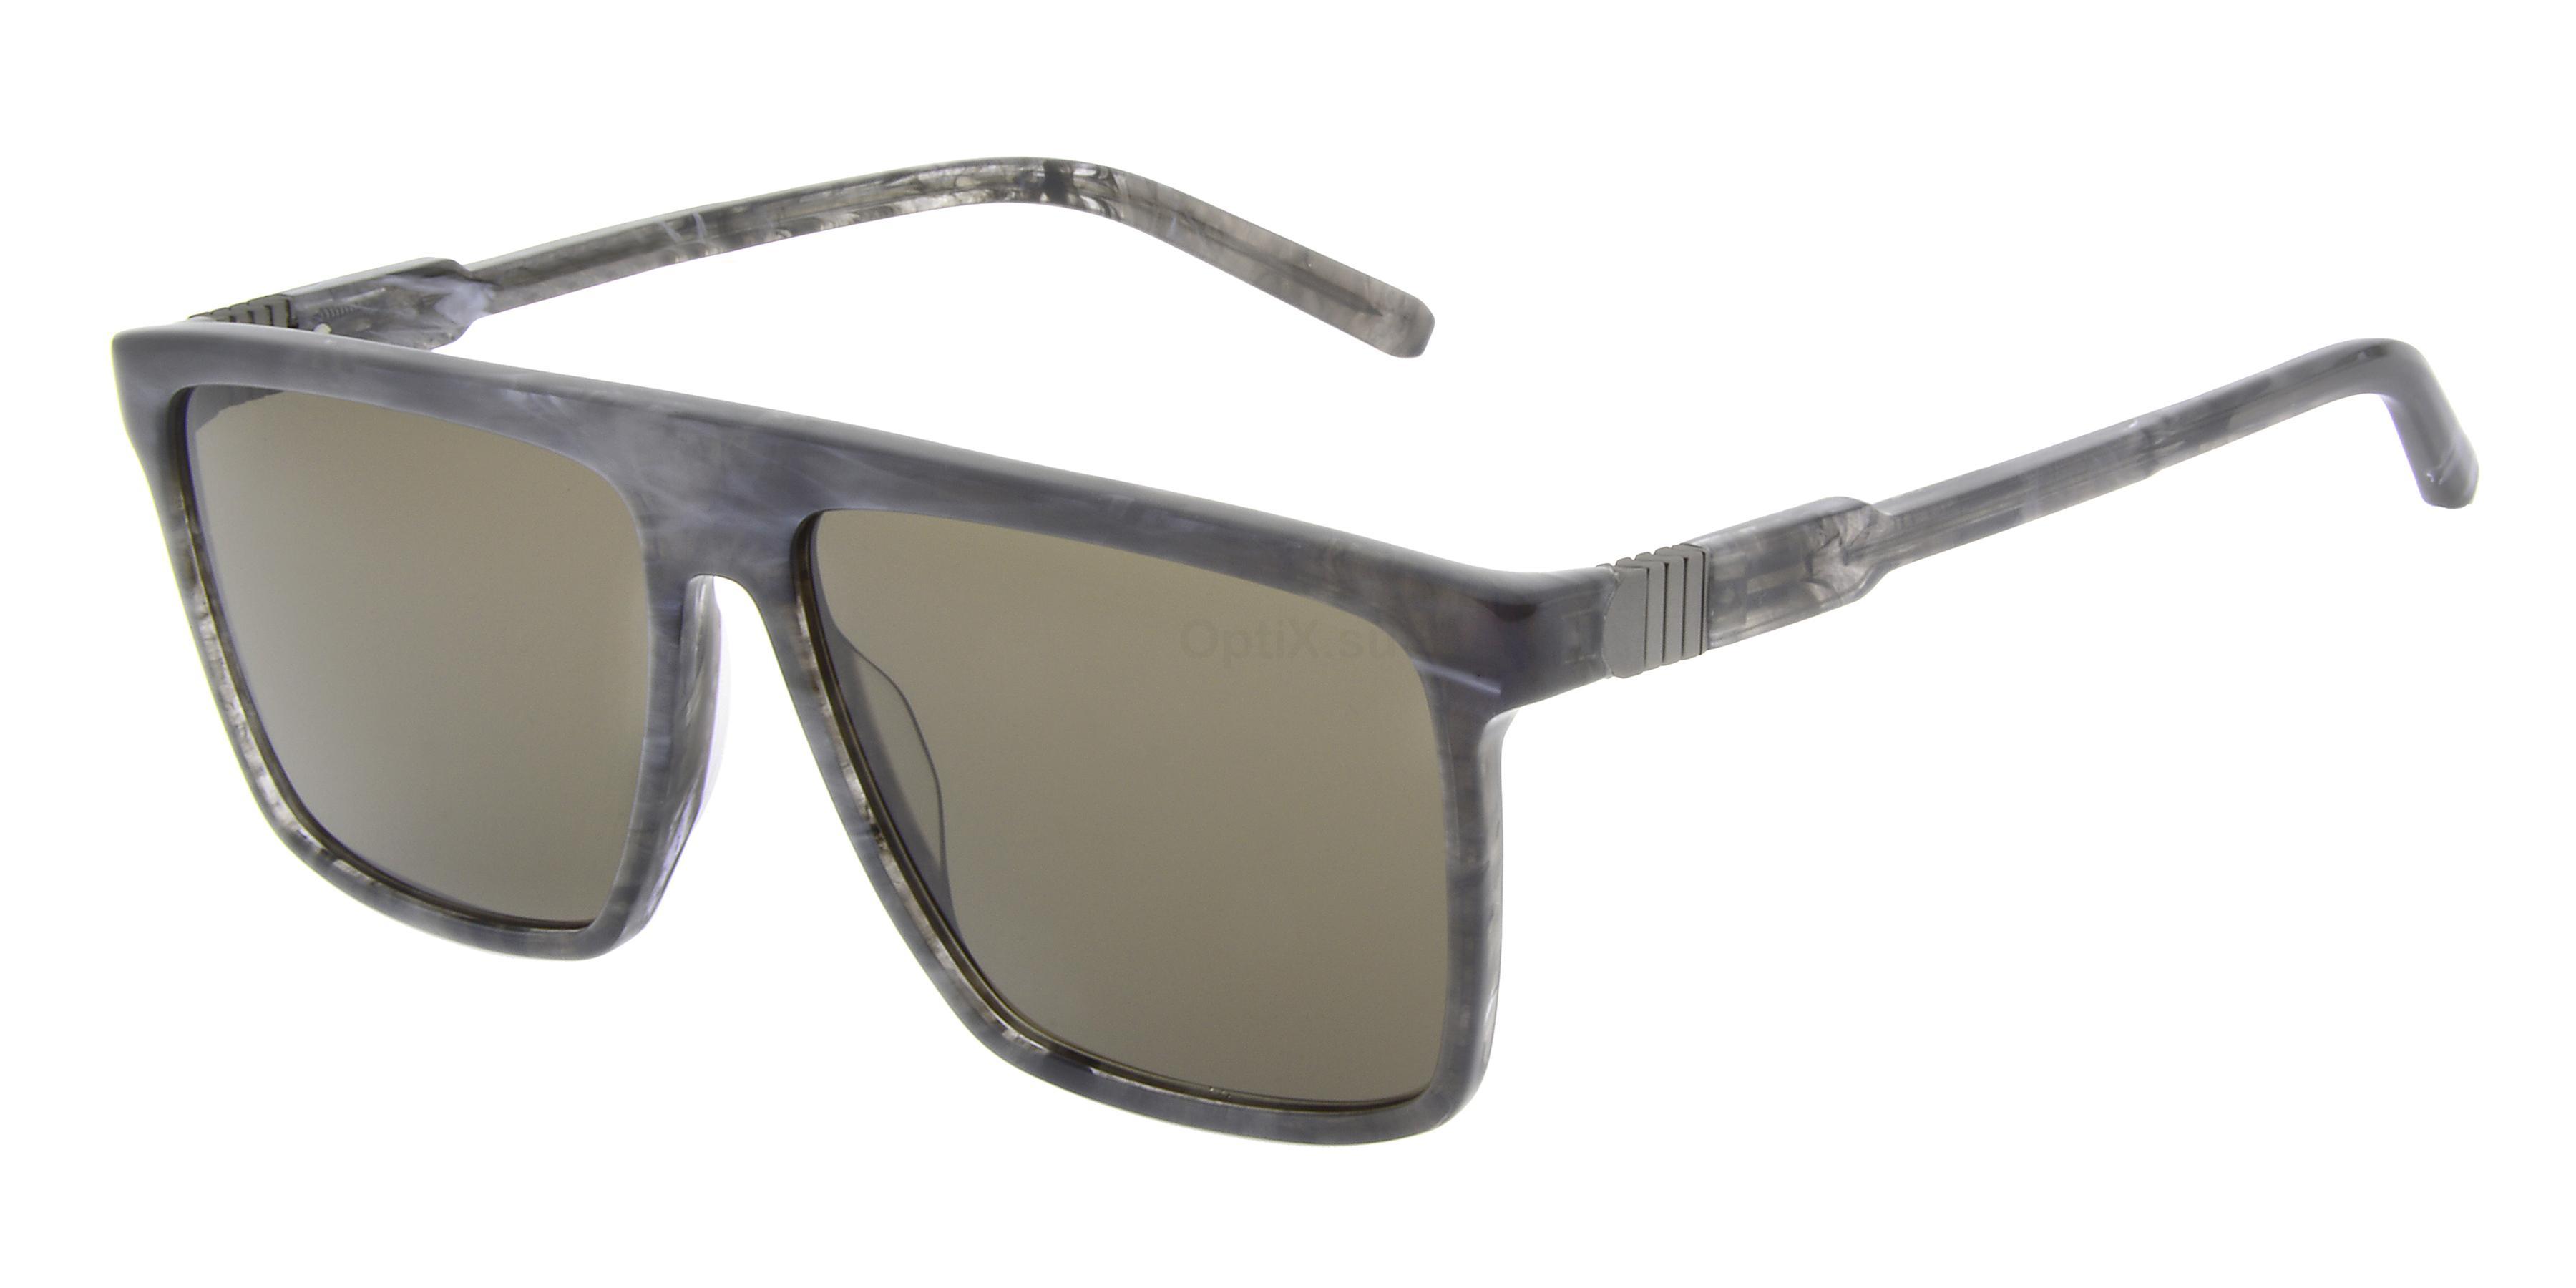 003 SP3016 Sunglasses, Spine